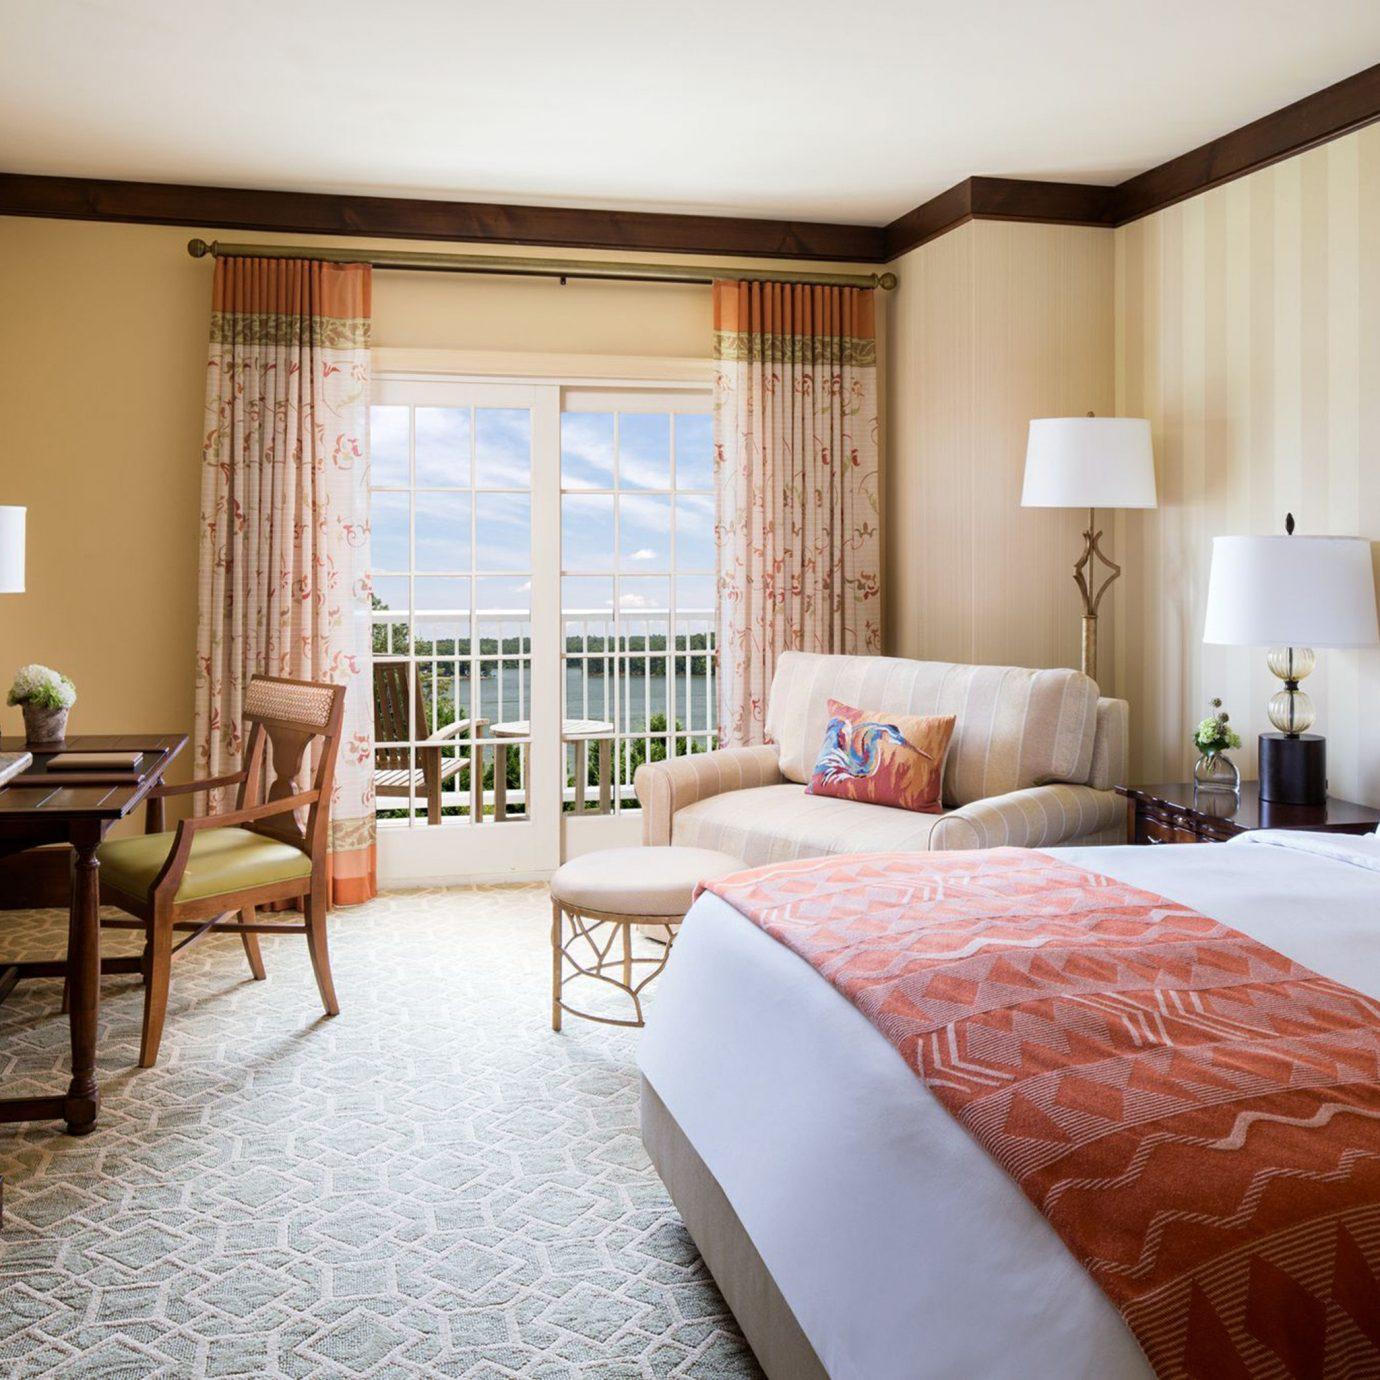 Bedroom Hip Luxury Romance Suite Trip Ideas sofa property home cottage living room condominium pillow containing